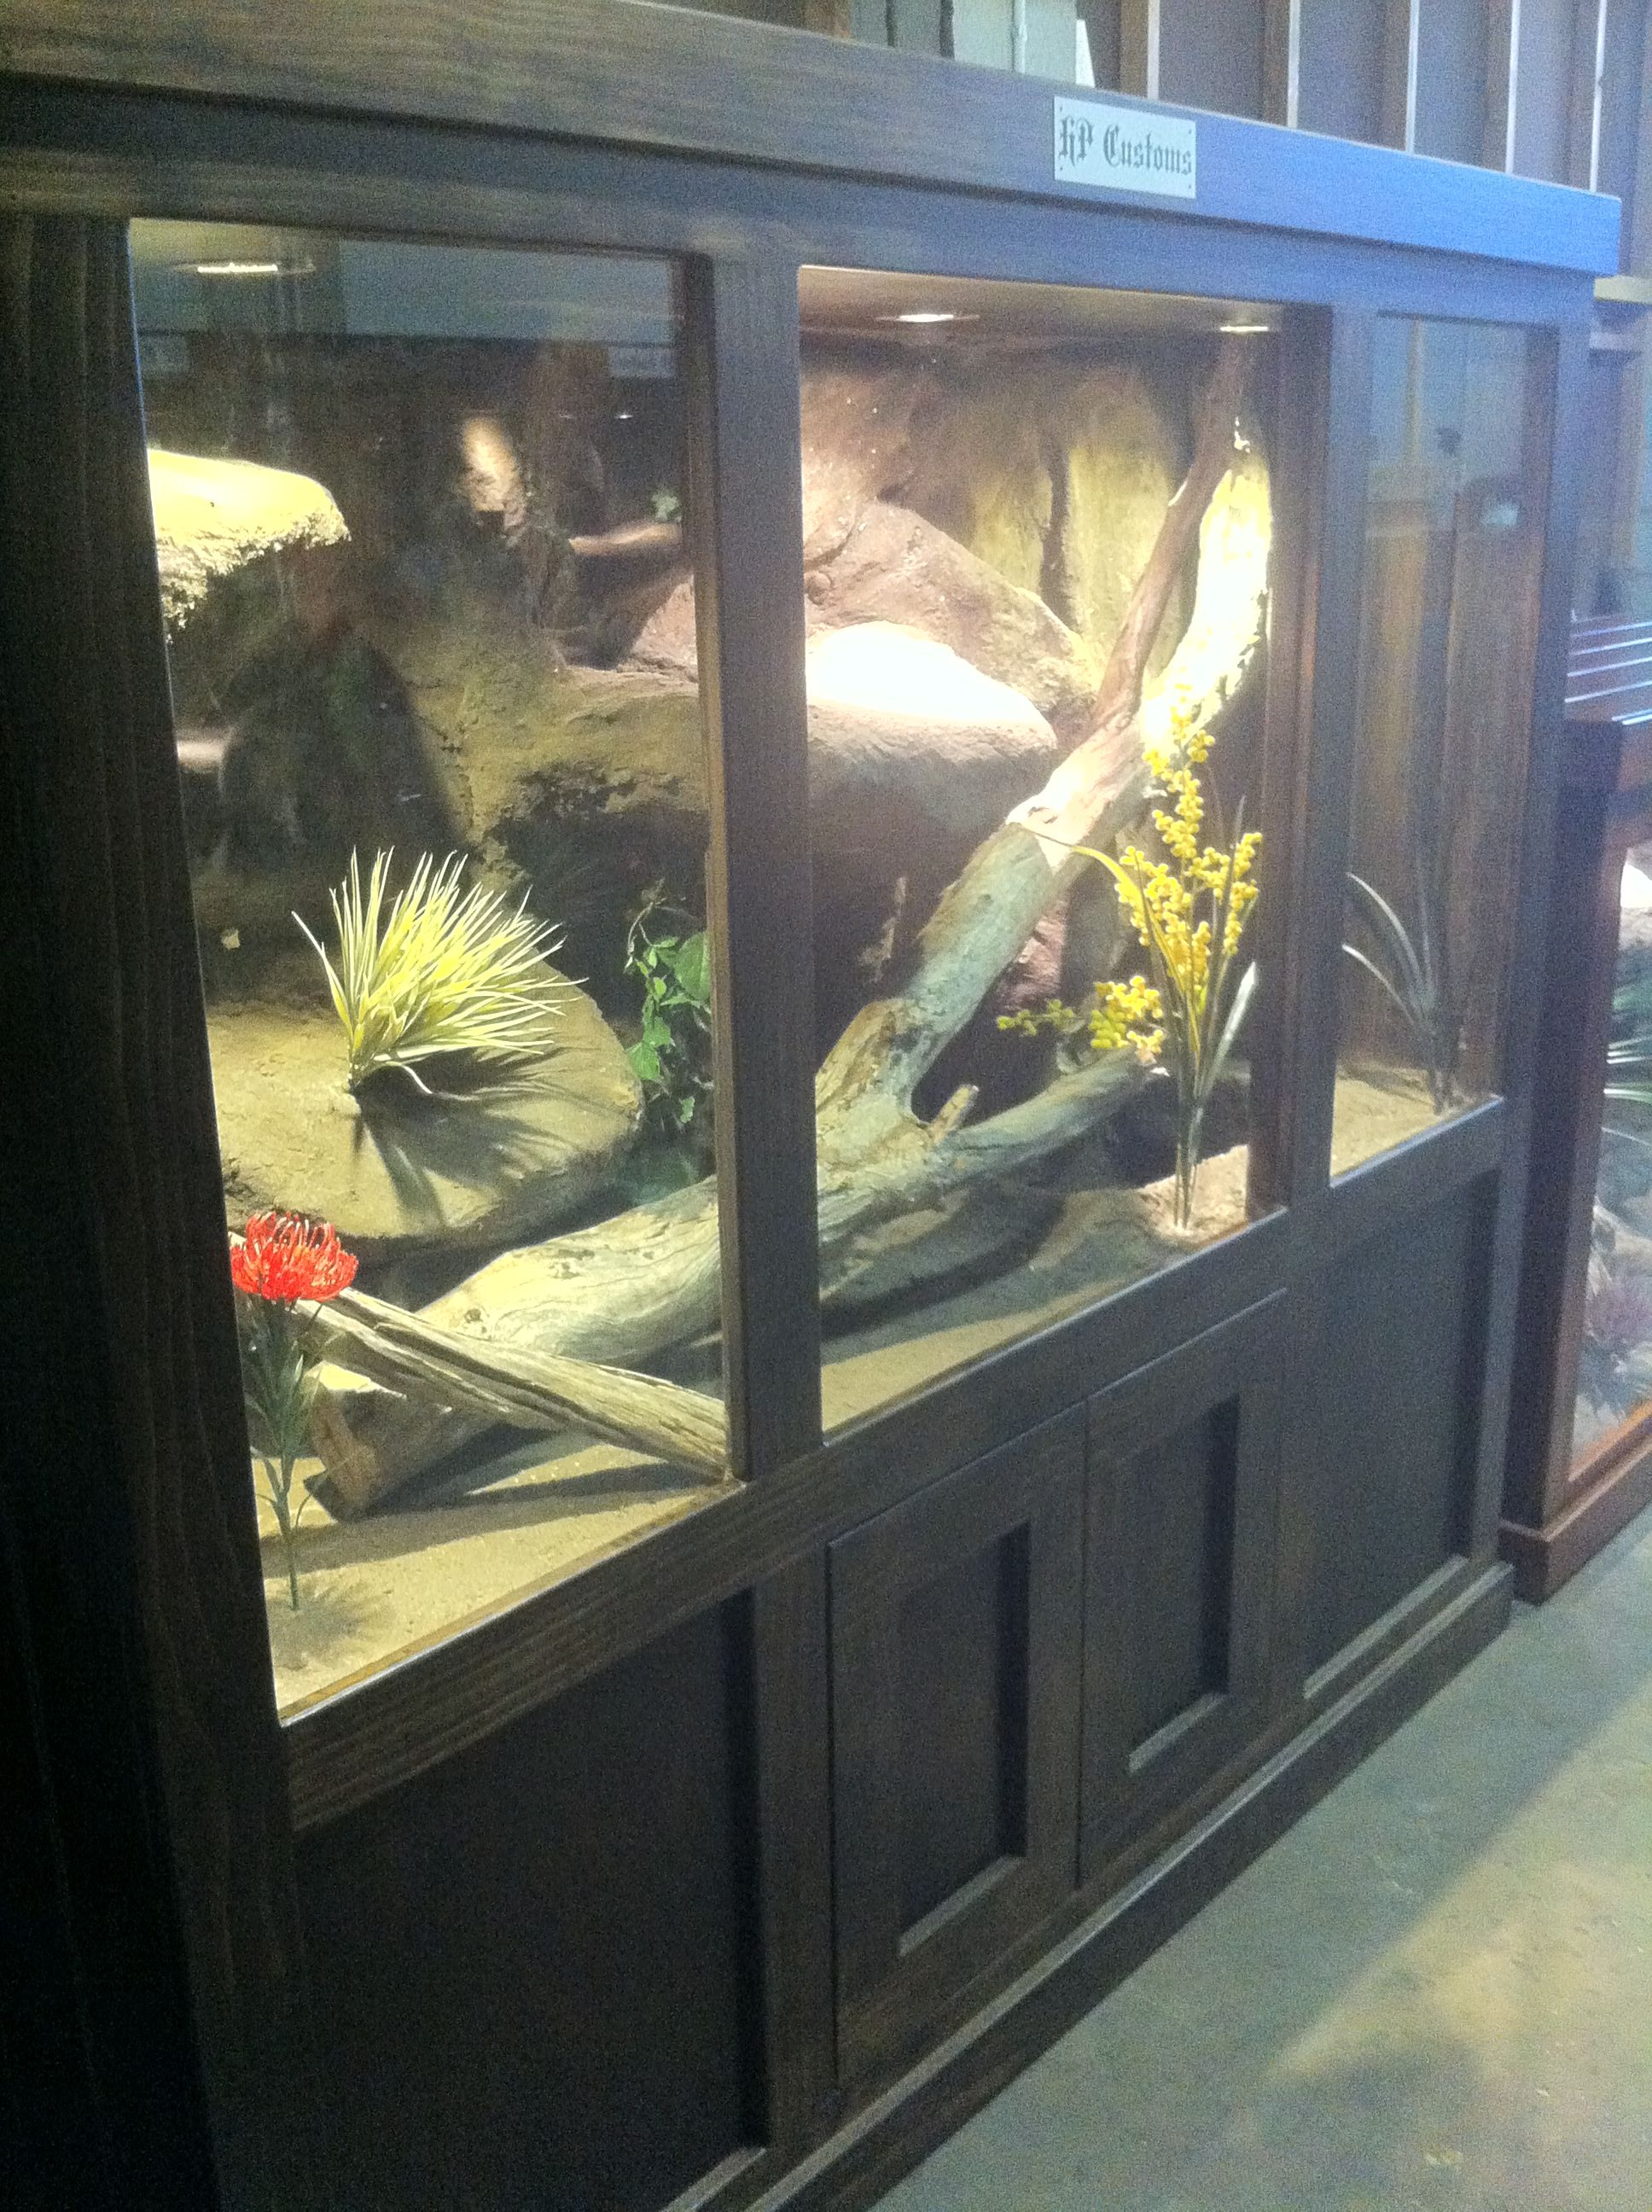 Reptile enclosure facebookpageshpcustomscustom